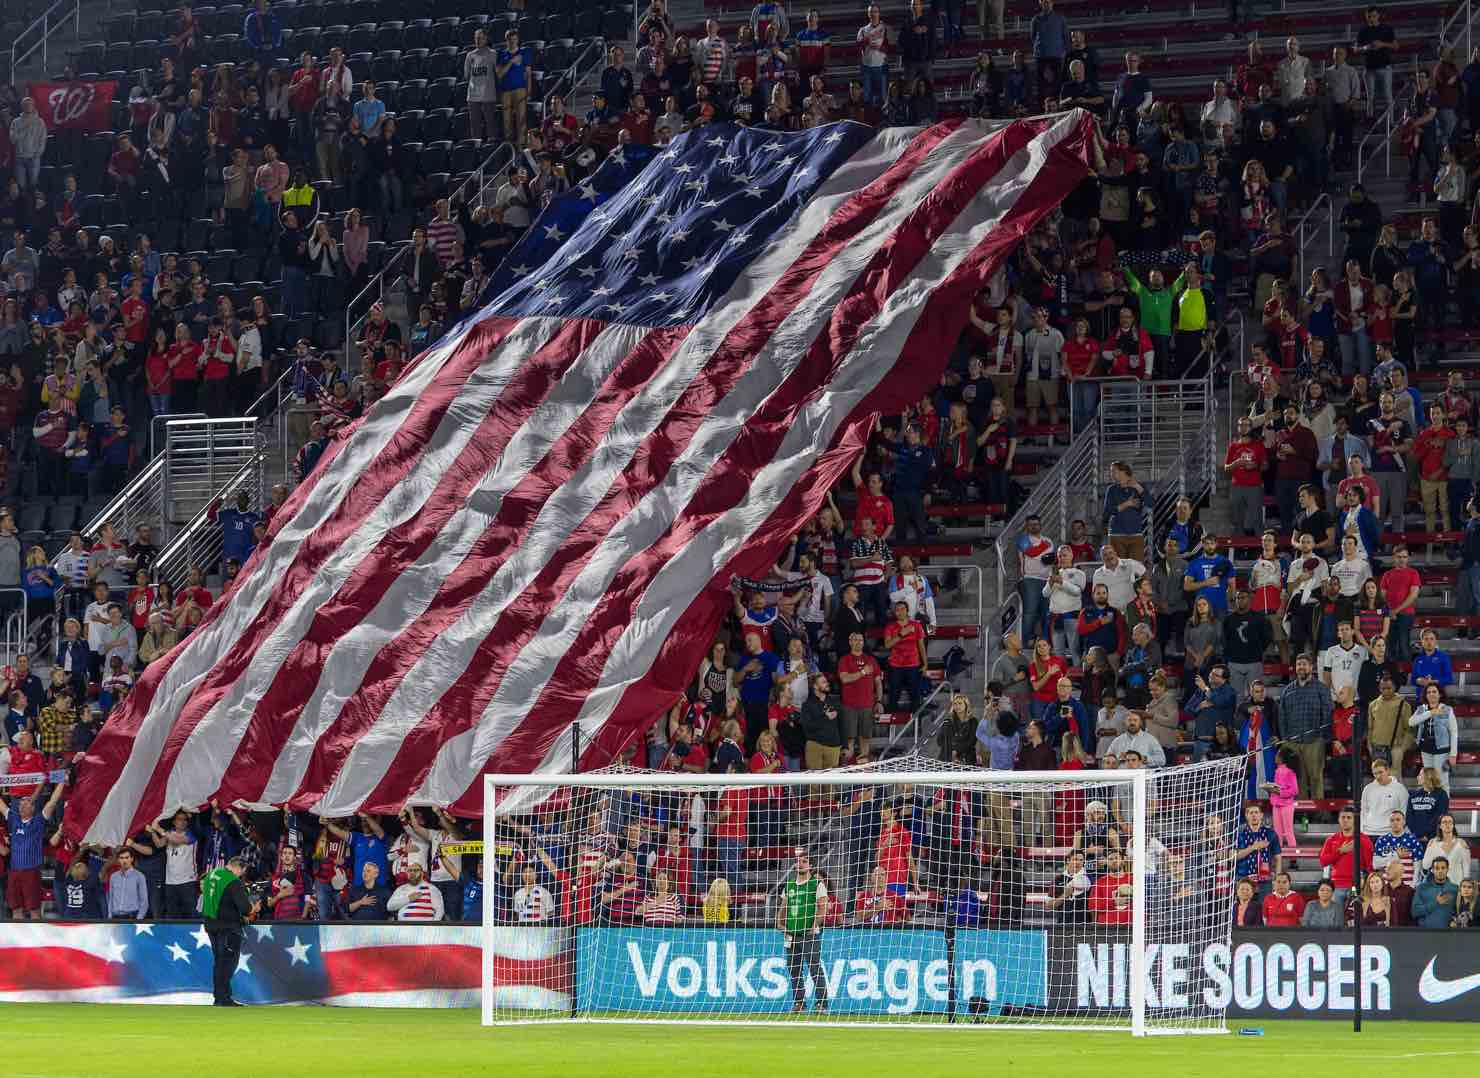 U.S. Soccer Crowd